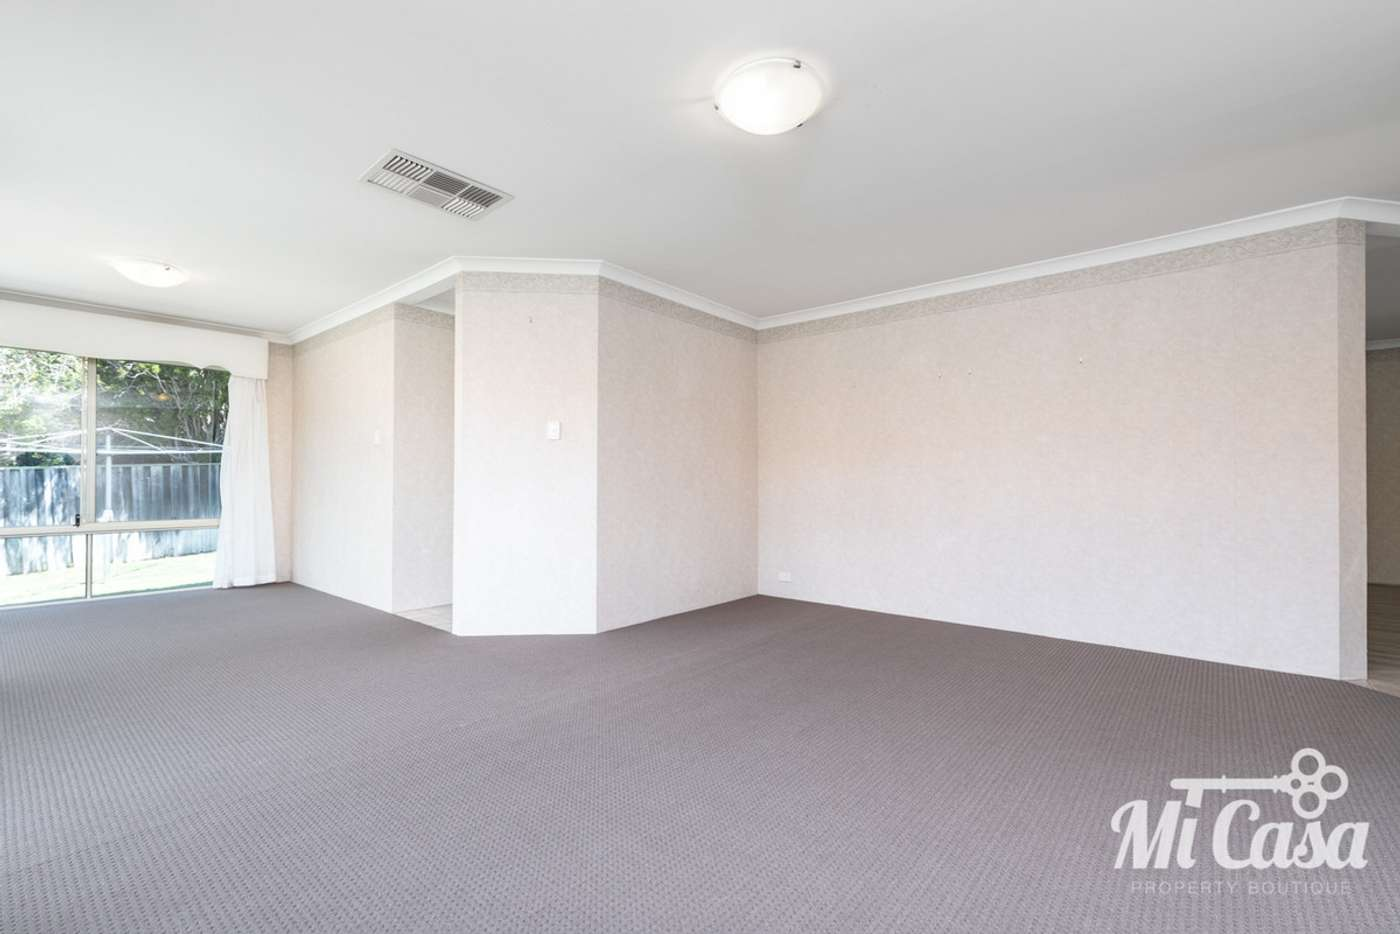 Fifth view of Homely house listing, 11 Drosera Loop, Beeliar WA 6164